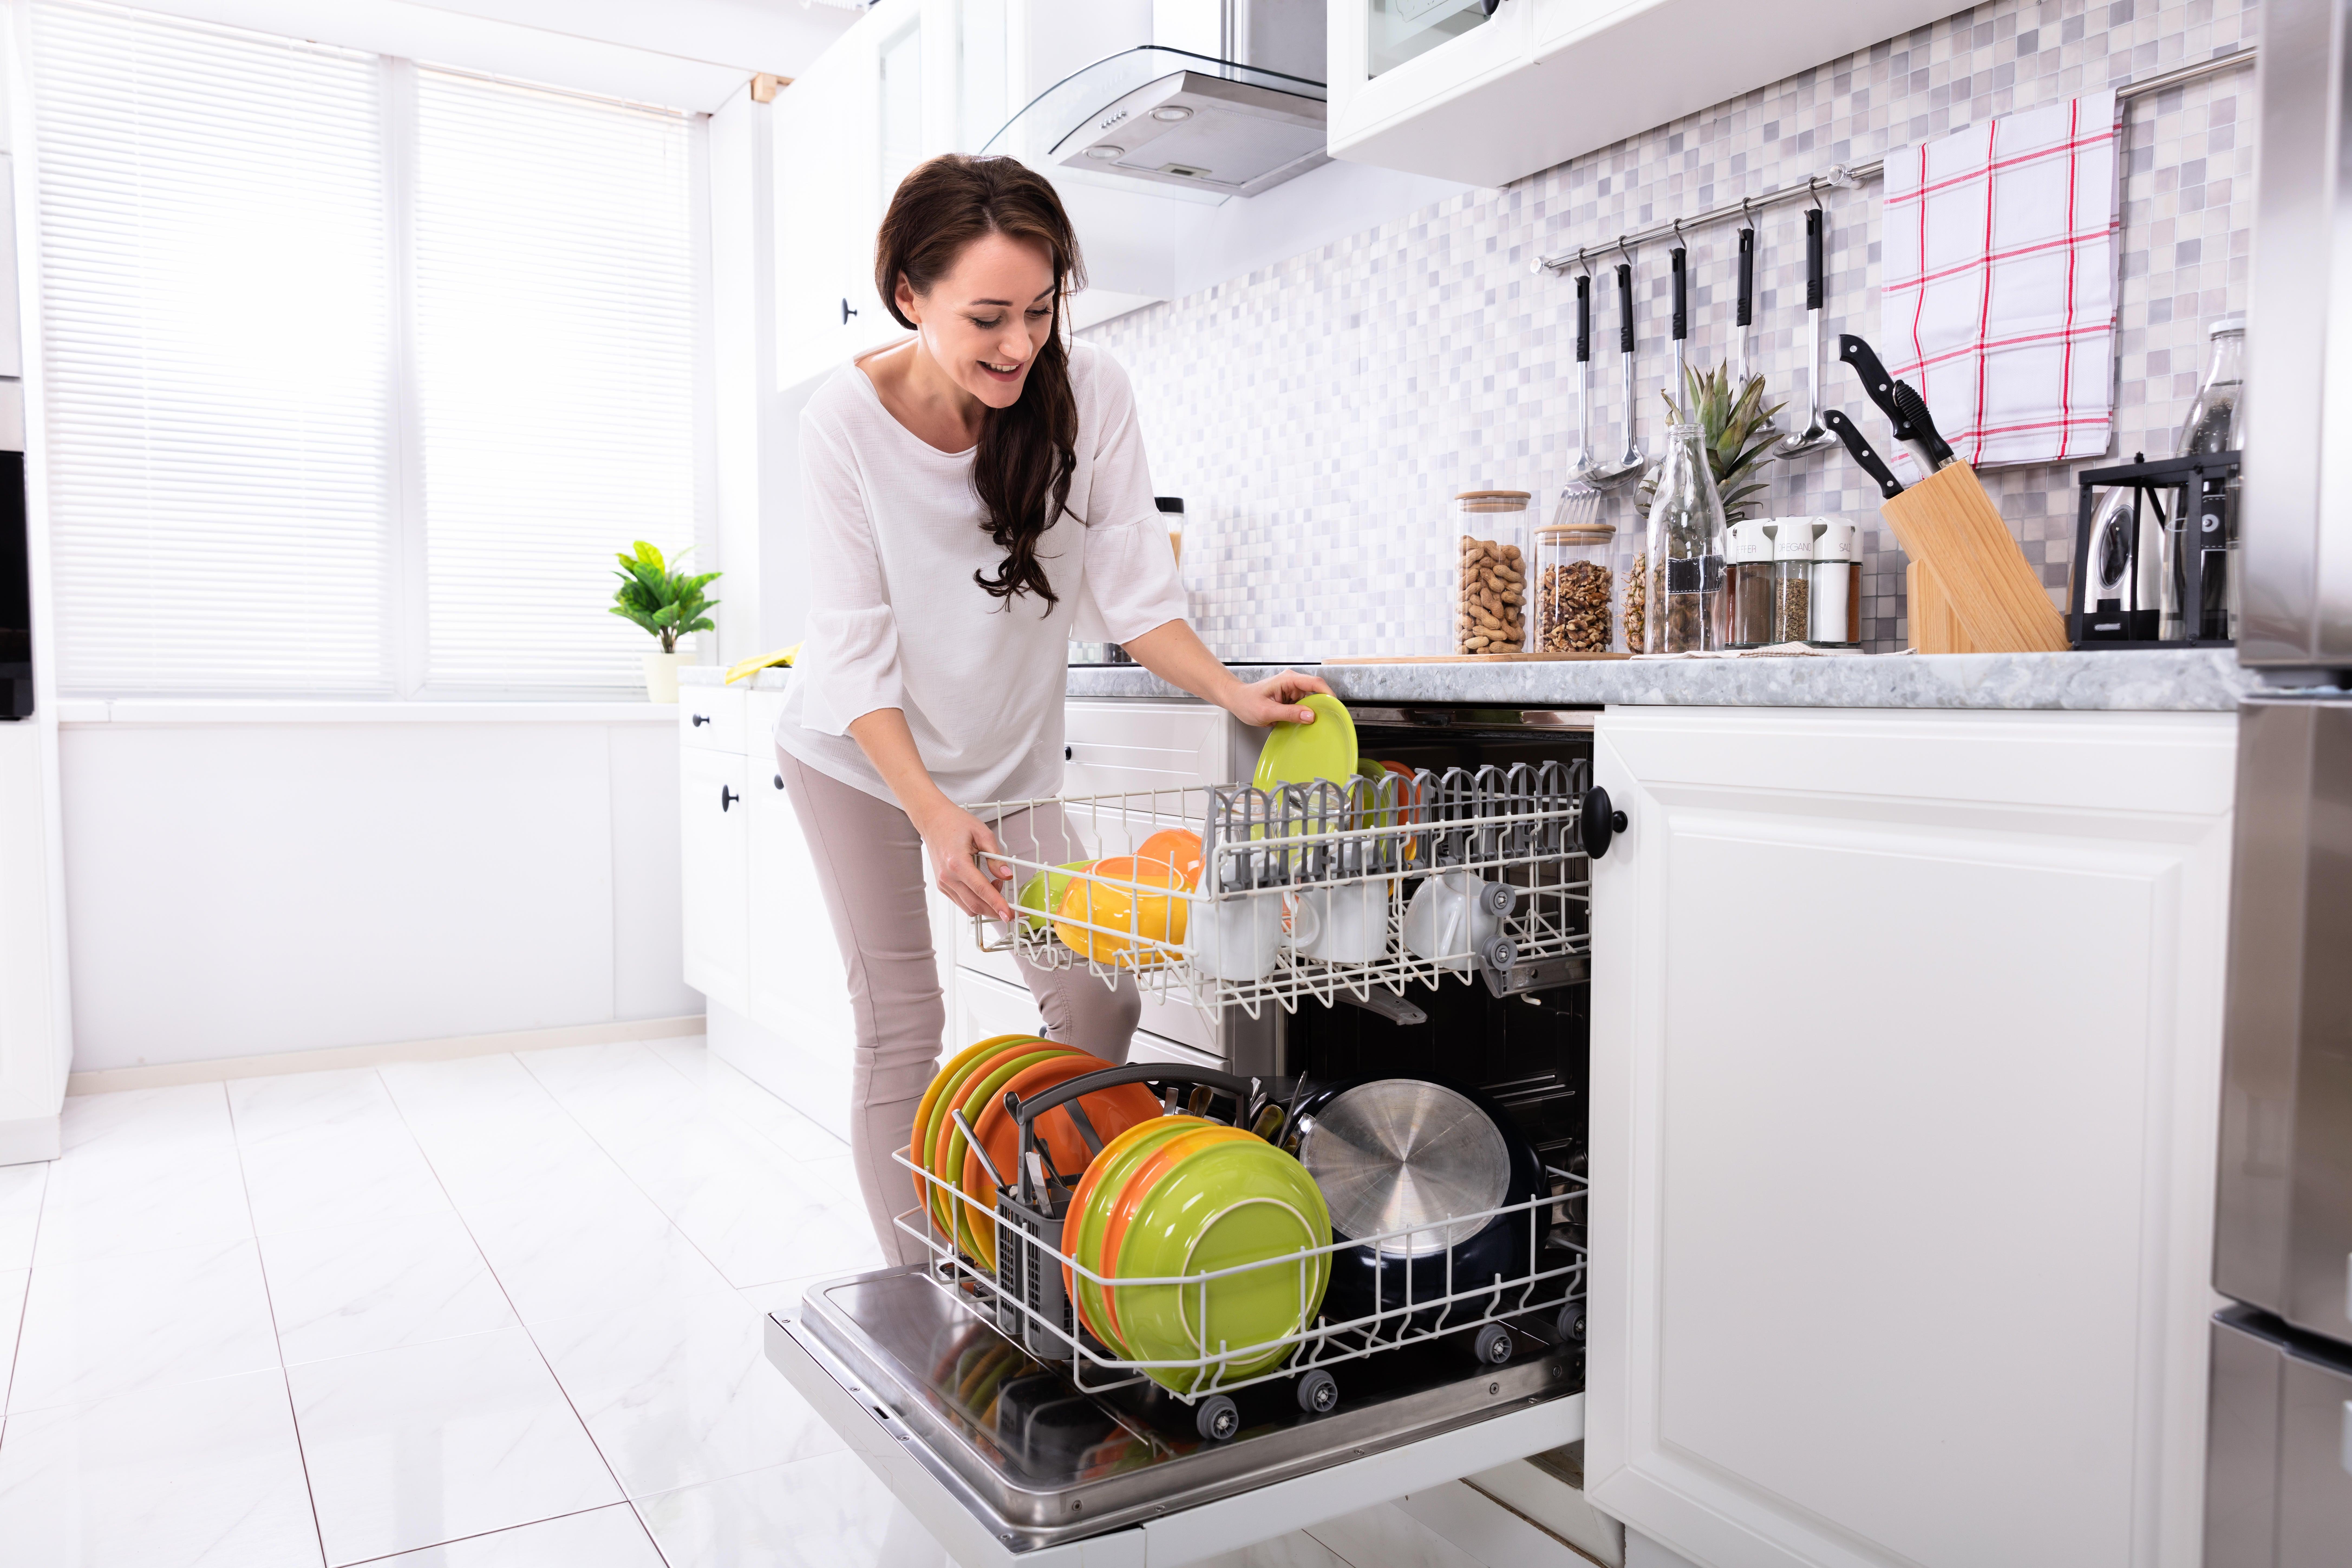 woman loads a dishwasher in a modern kitchen